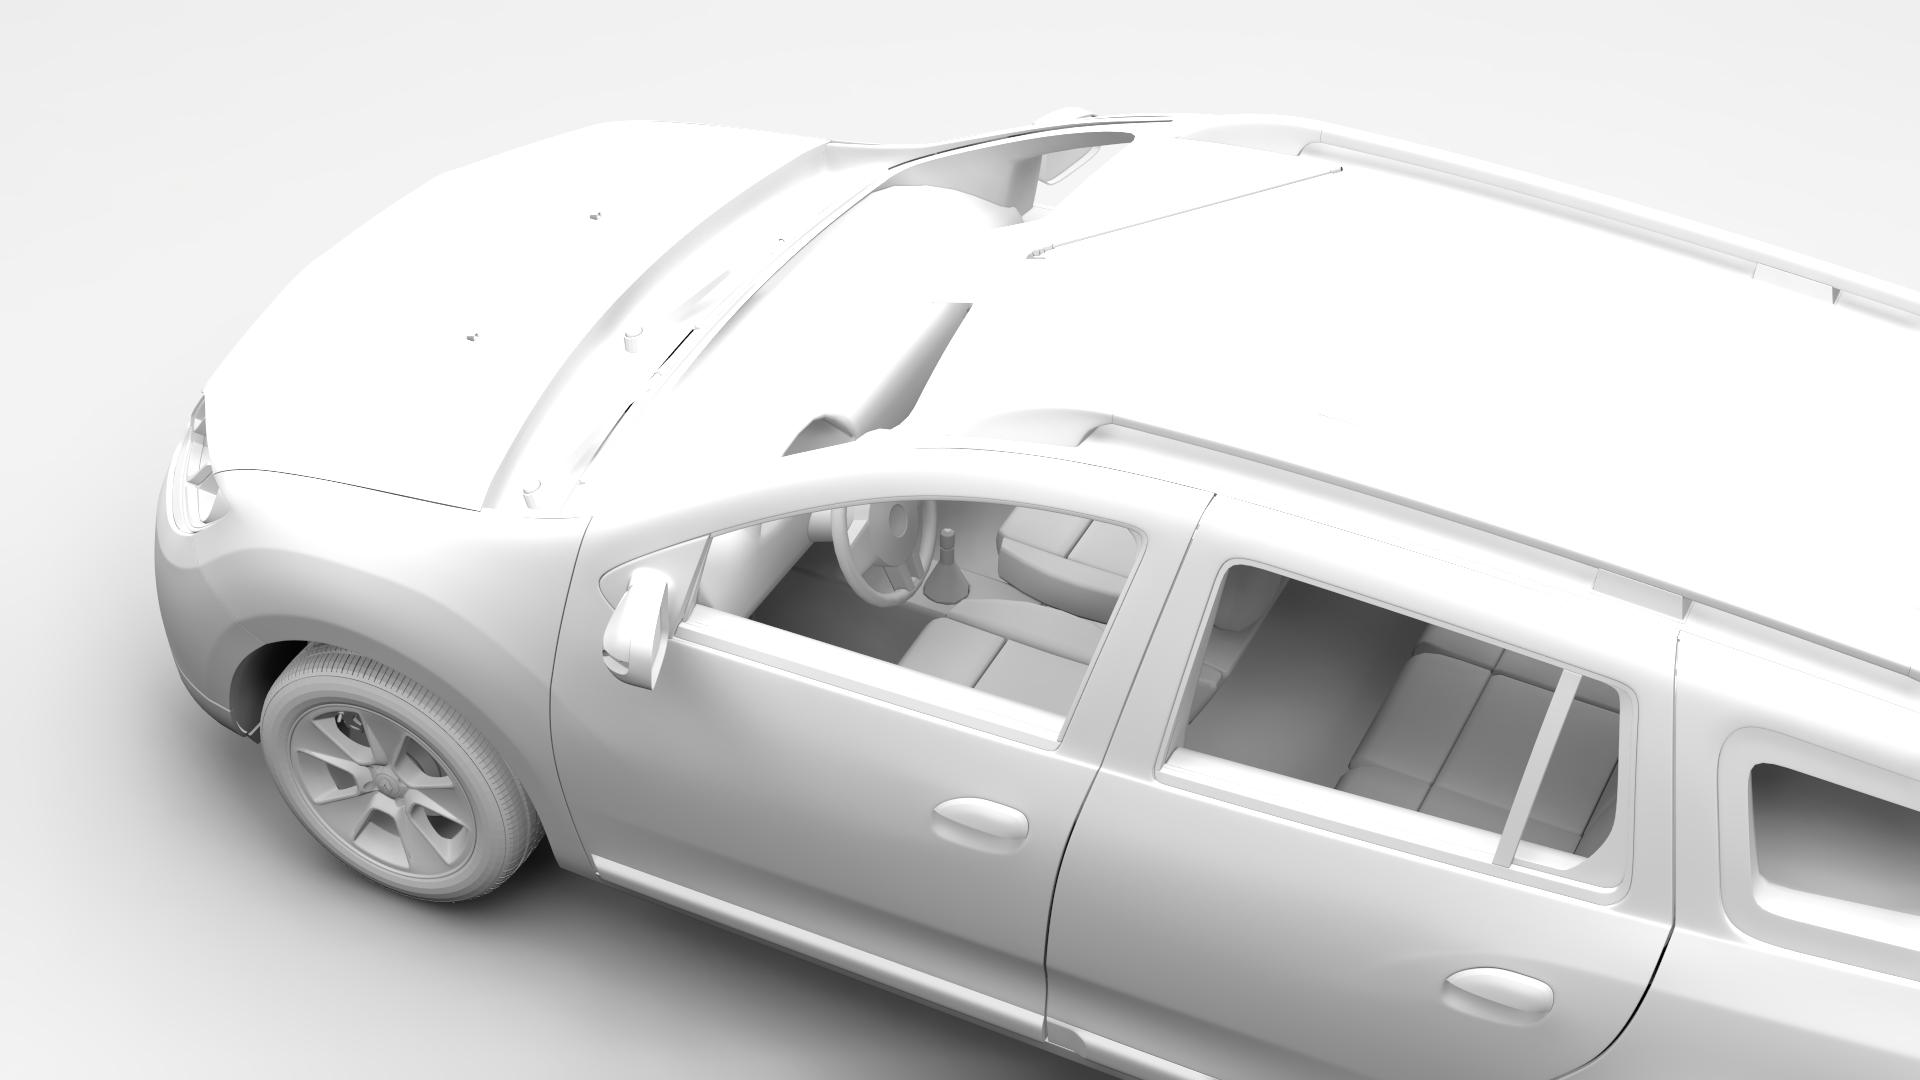 renault logan mcv 2016 3d modelis 3ds maks.